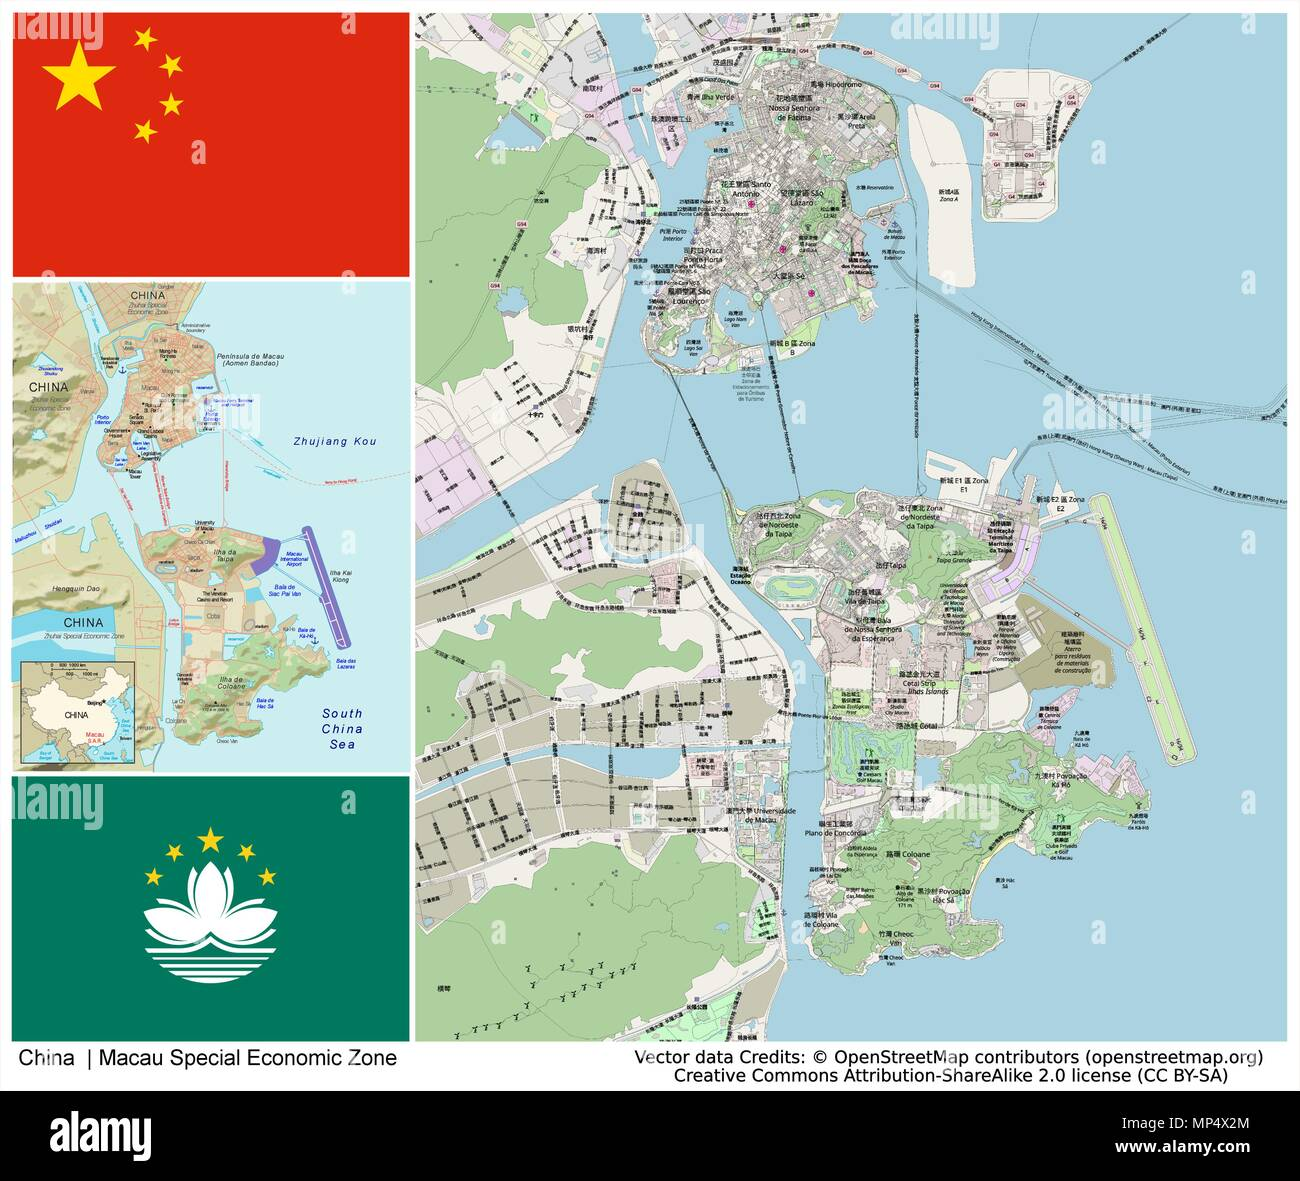 Macau China Special Economic Zone - Stock Vector